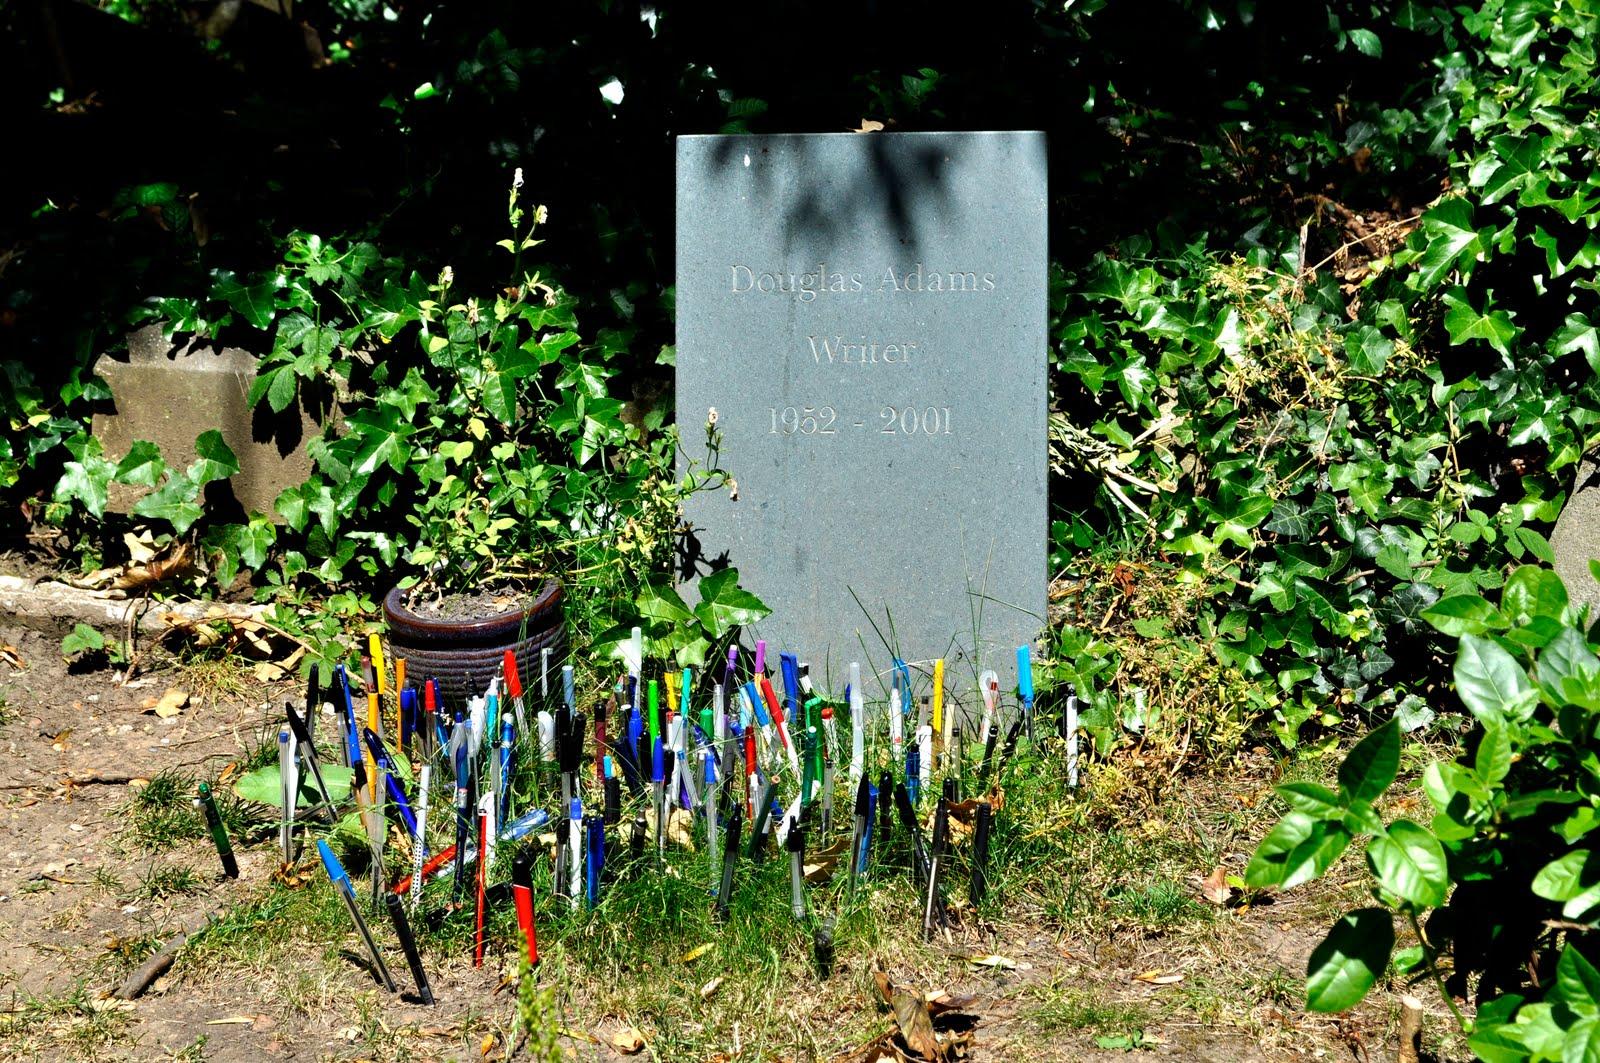 Douglas Adams's grave in London (via London Adventure)